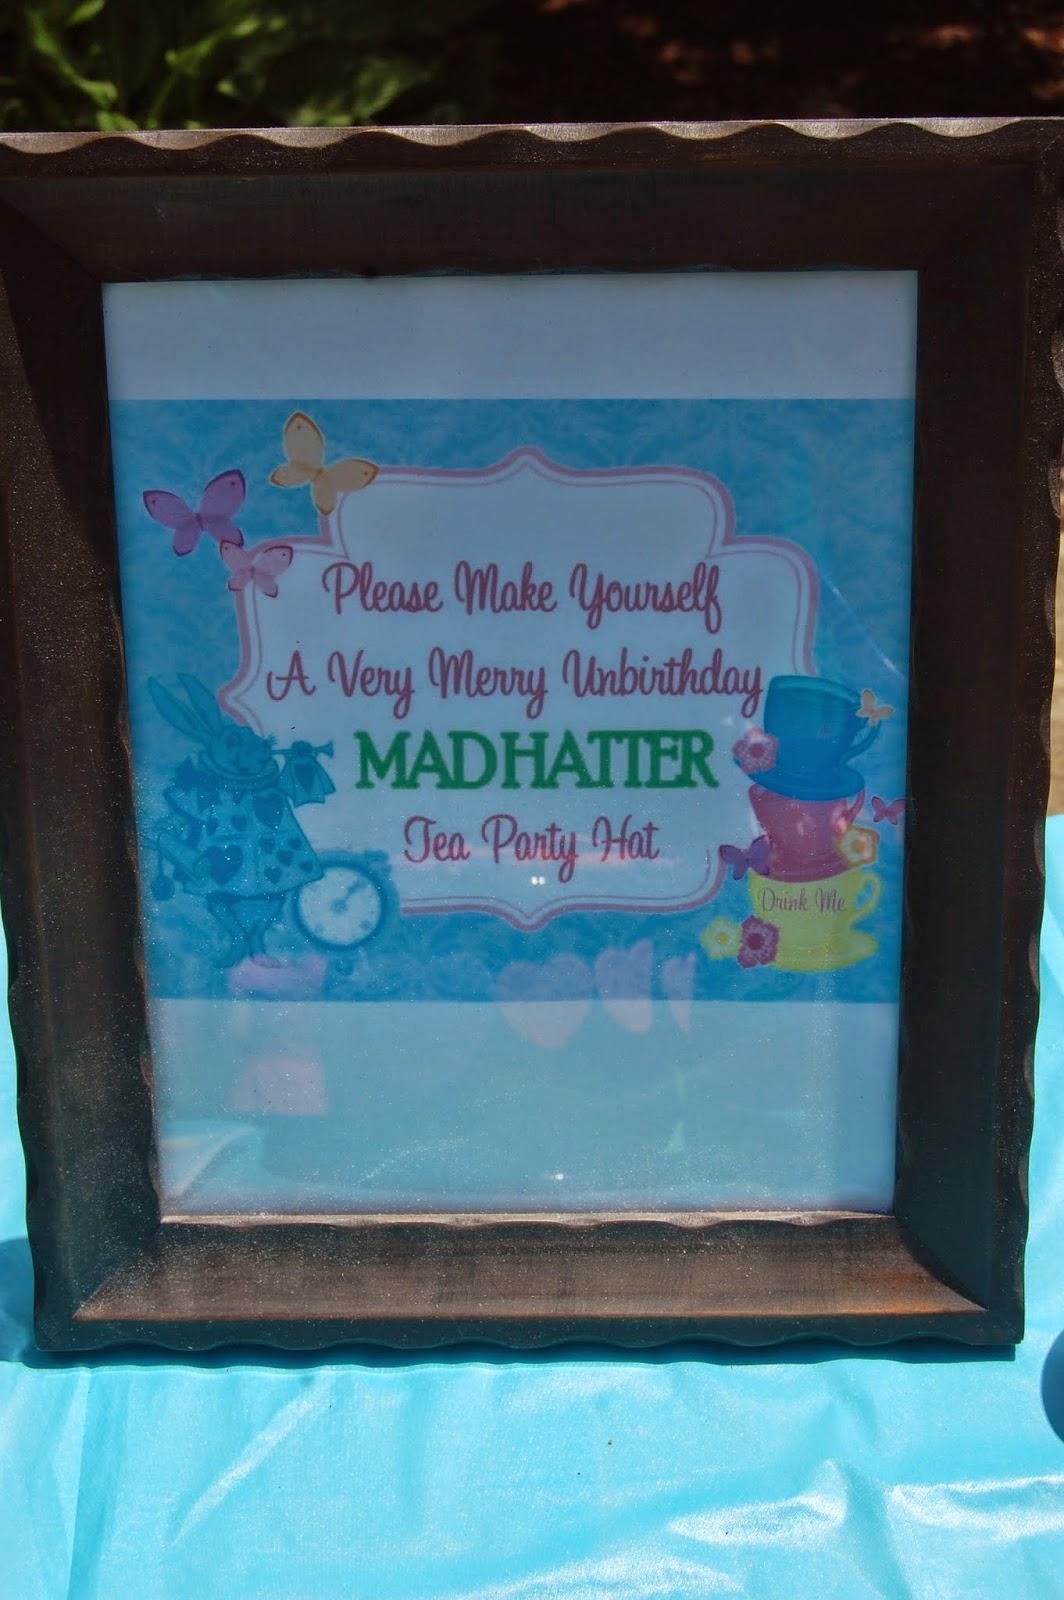 Mad hatter craft